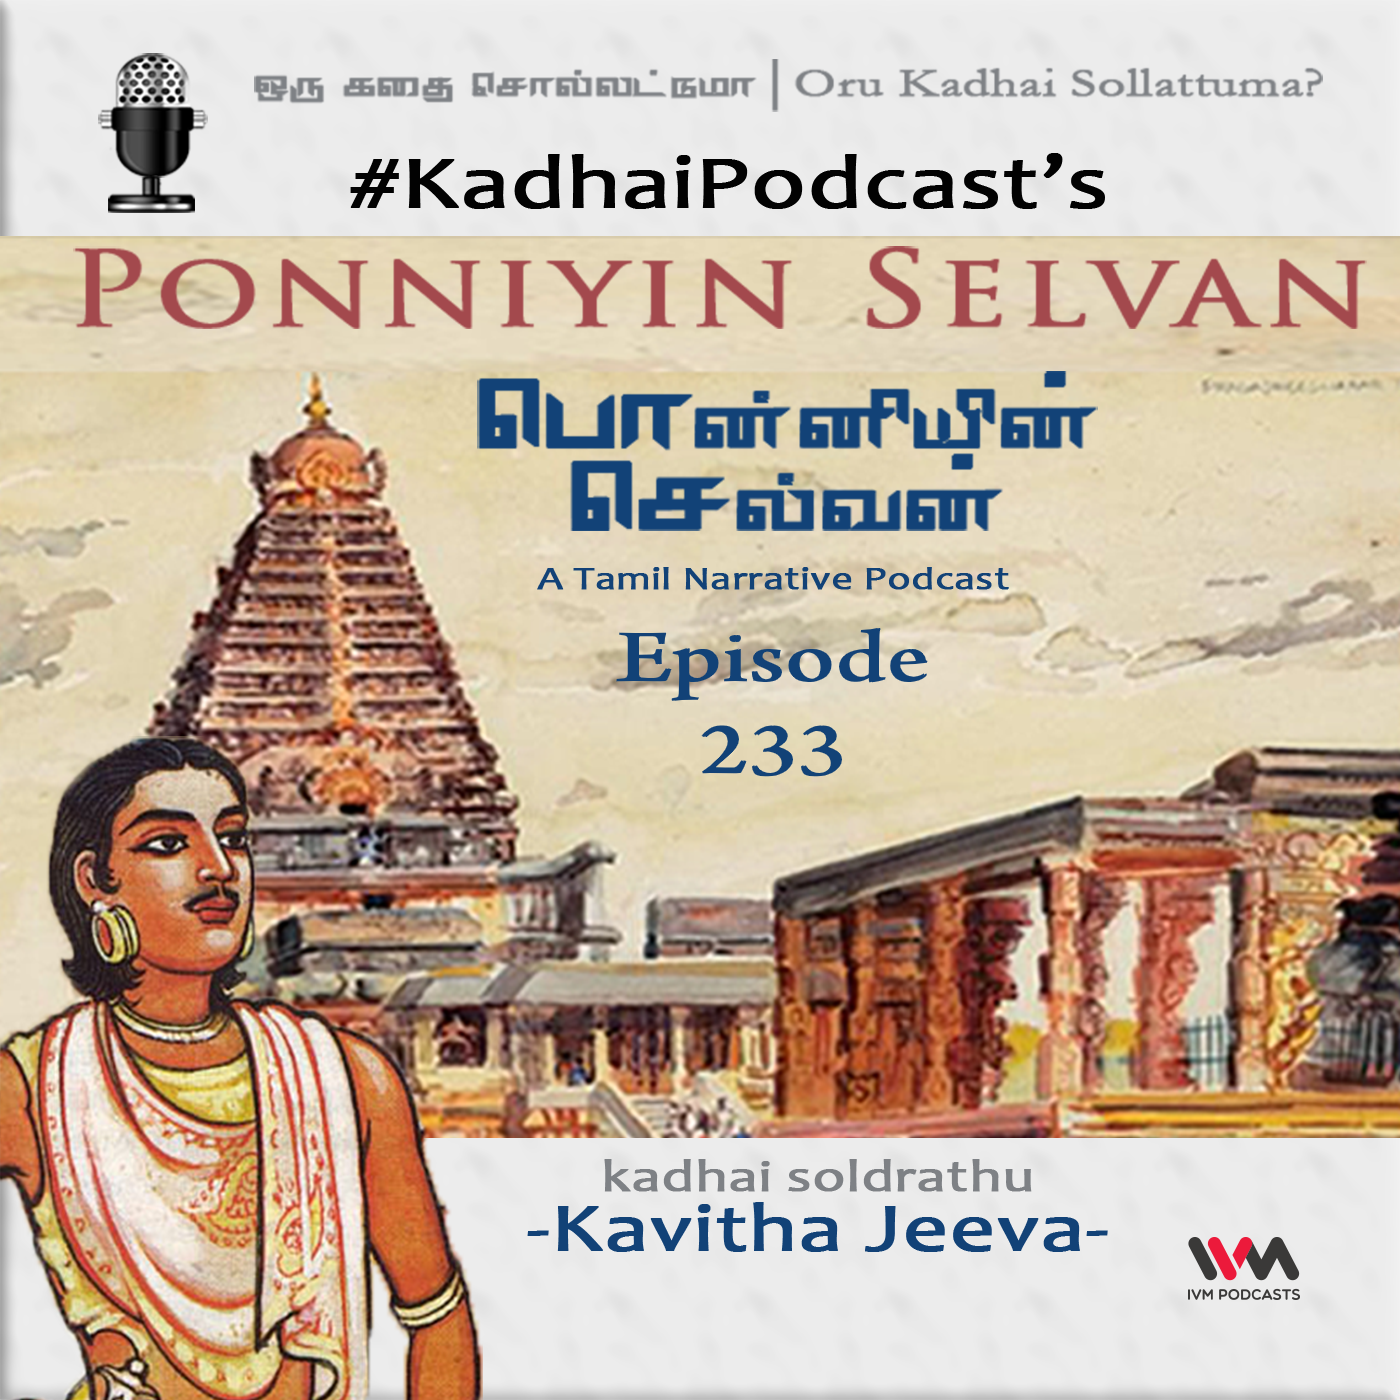 KadhaiPodcast's Ponniyin Selvan - Episode # 233